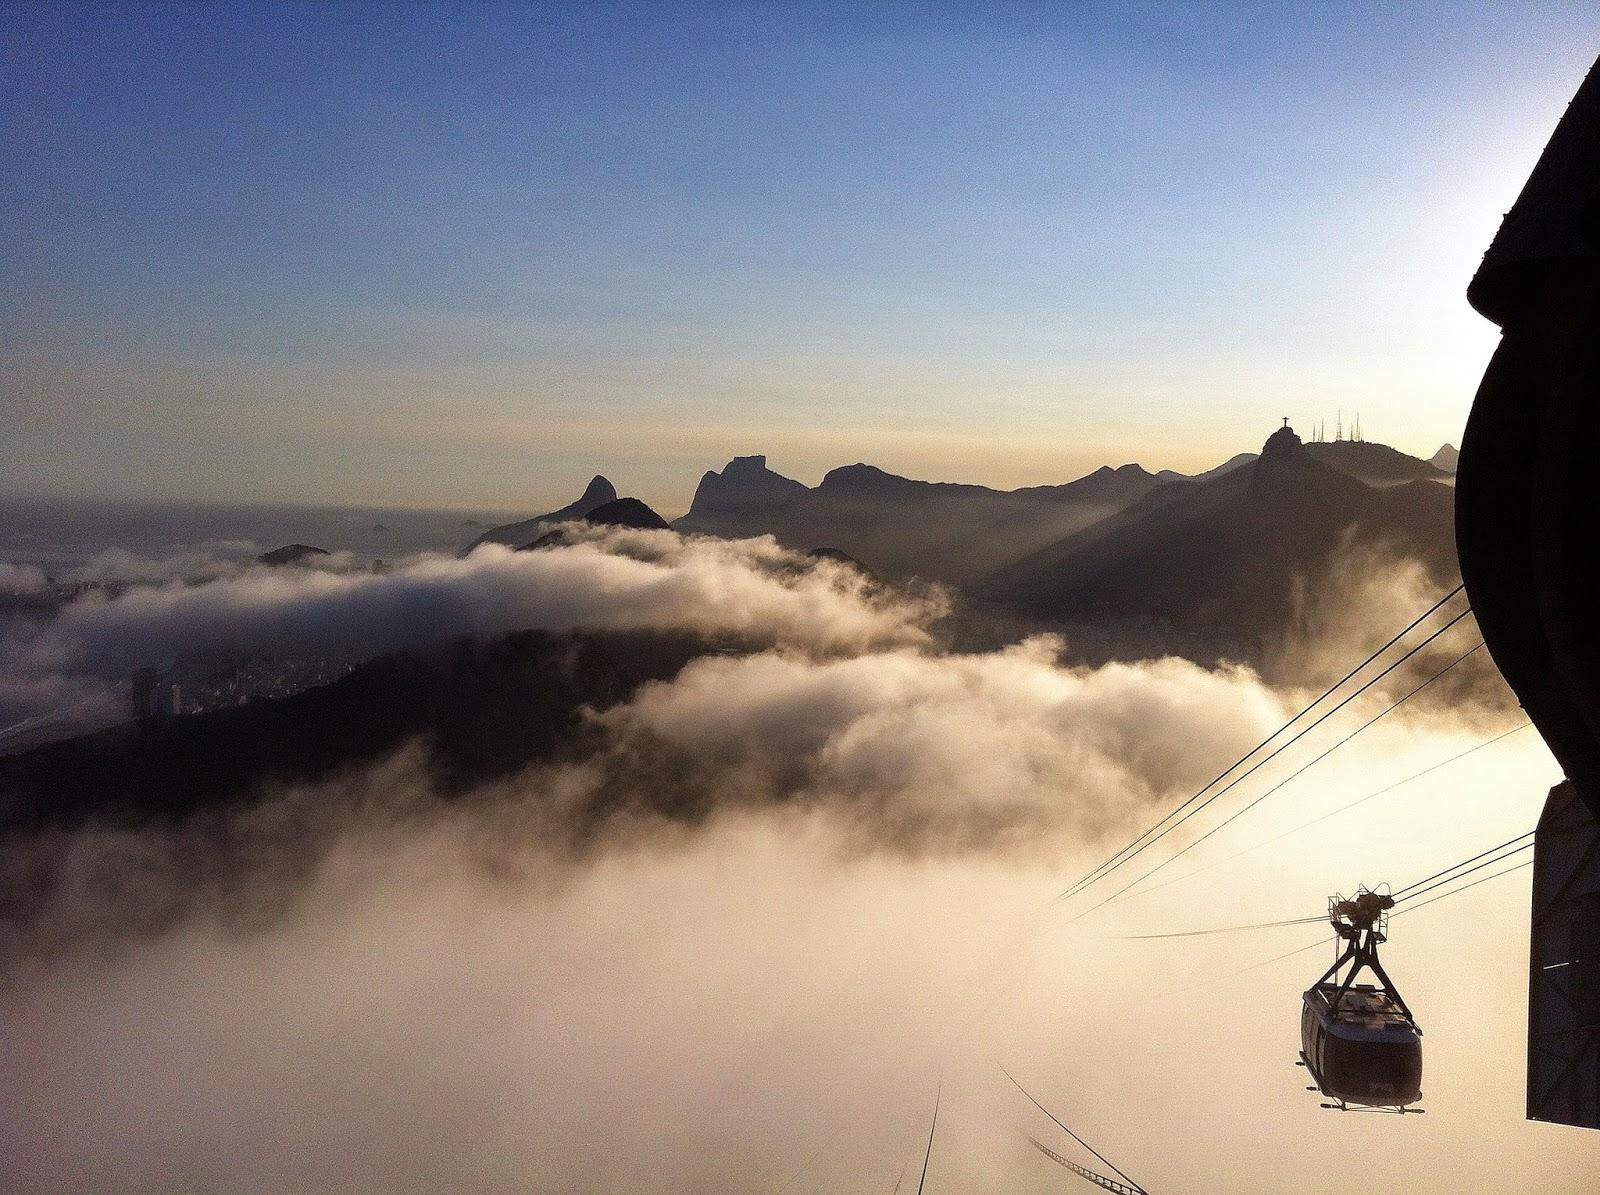 Gondola to Sugarloaf Mountain Rio de Janeiro